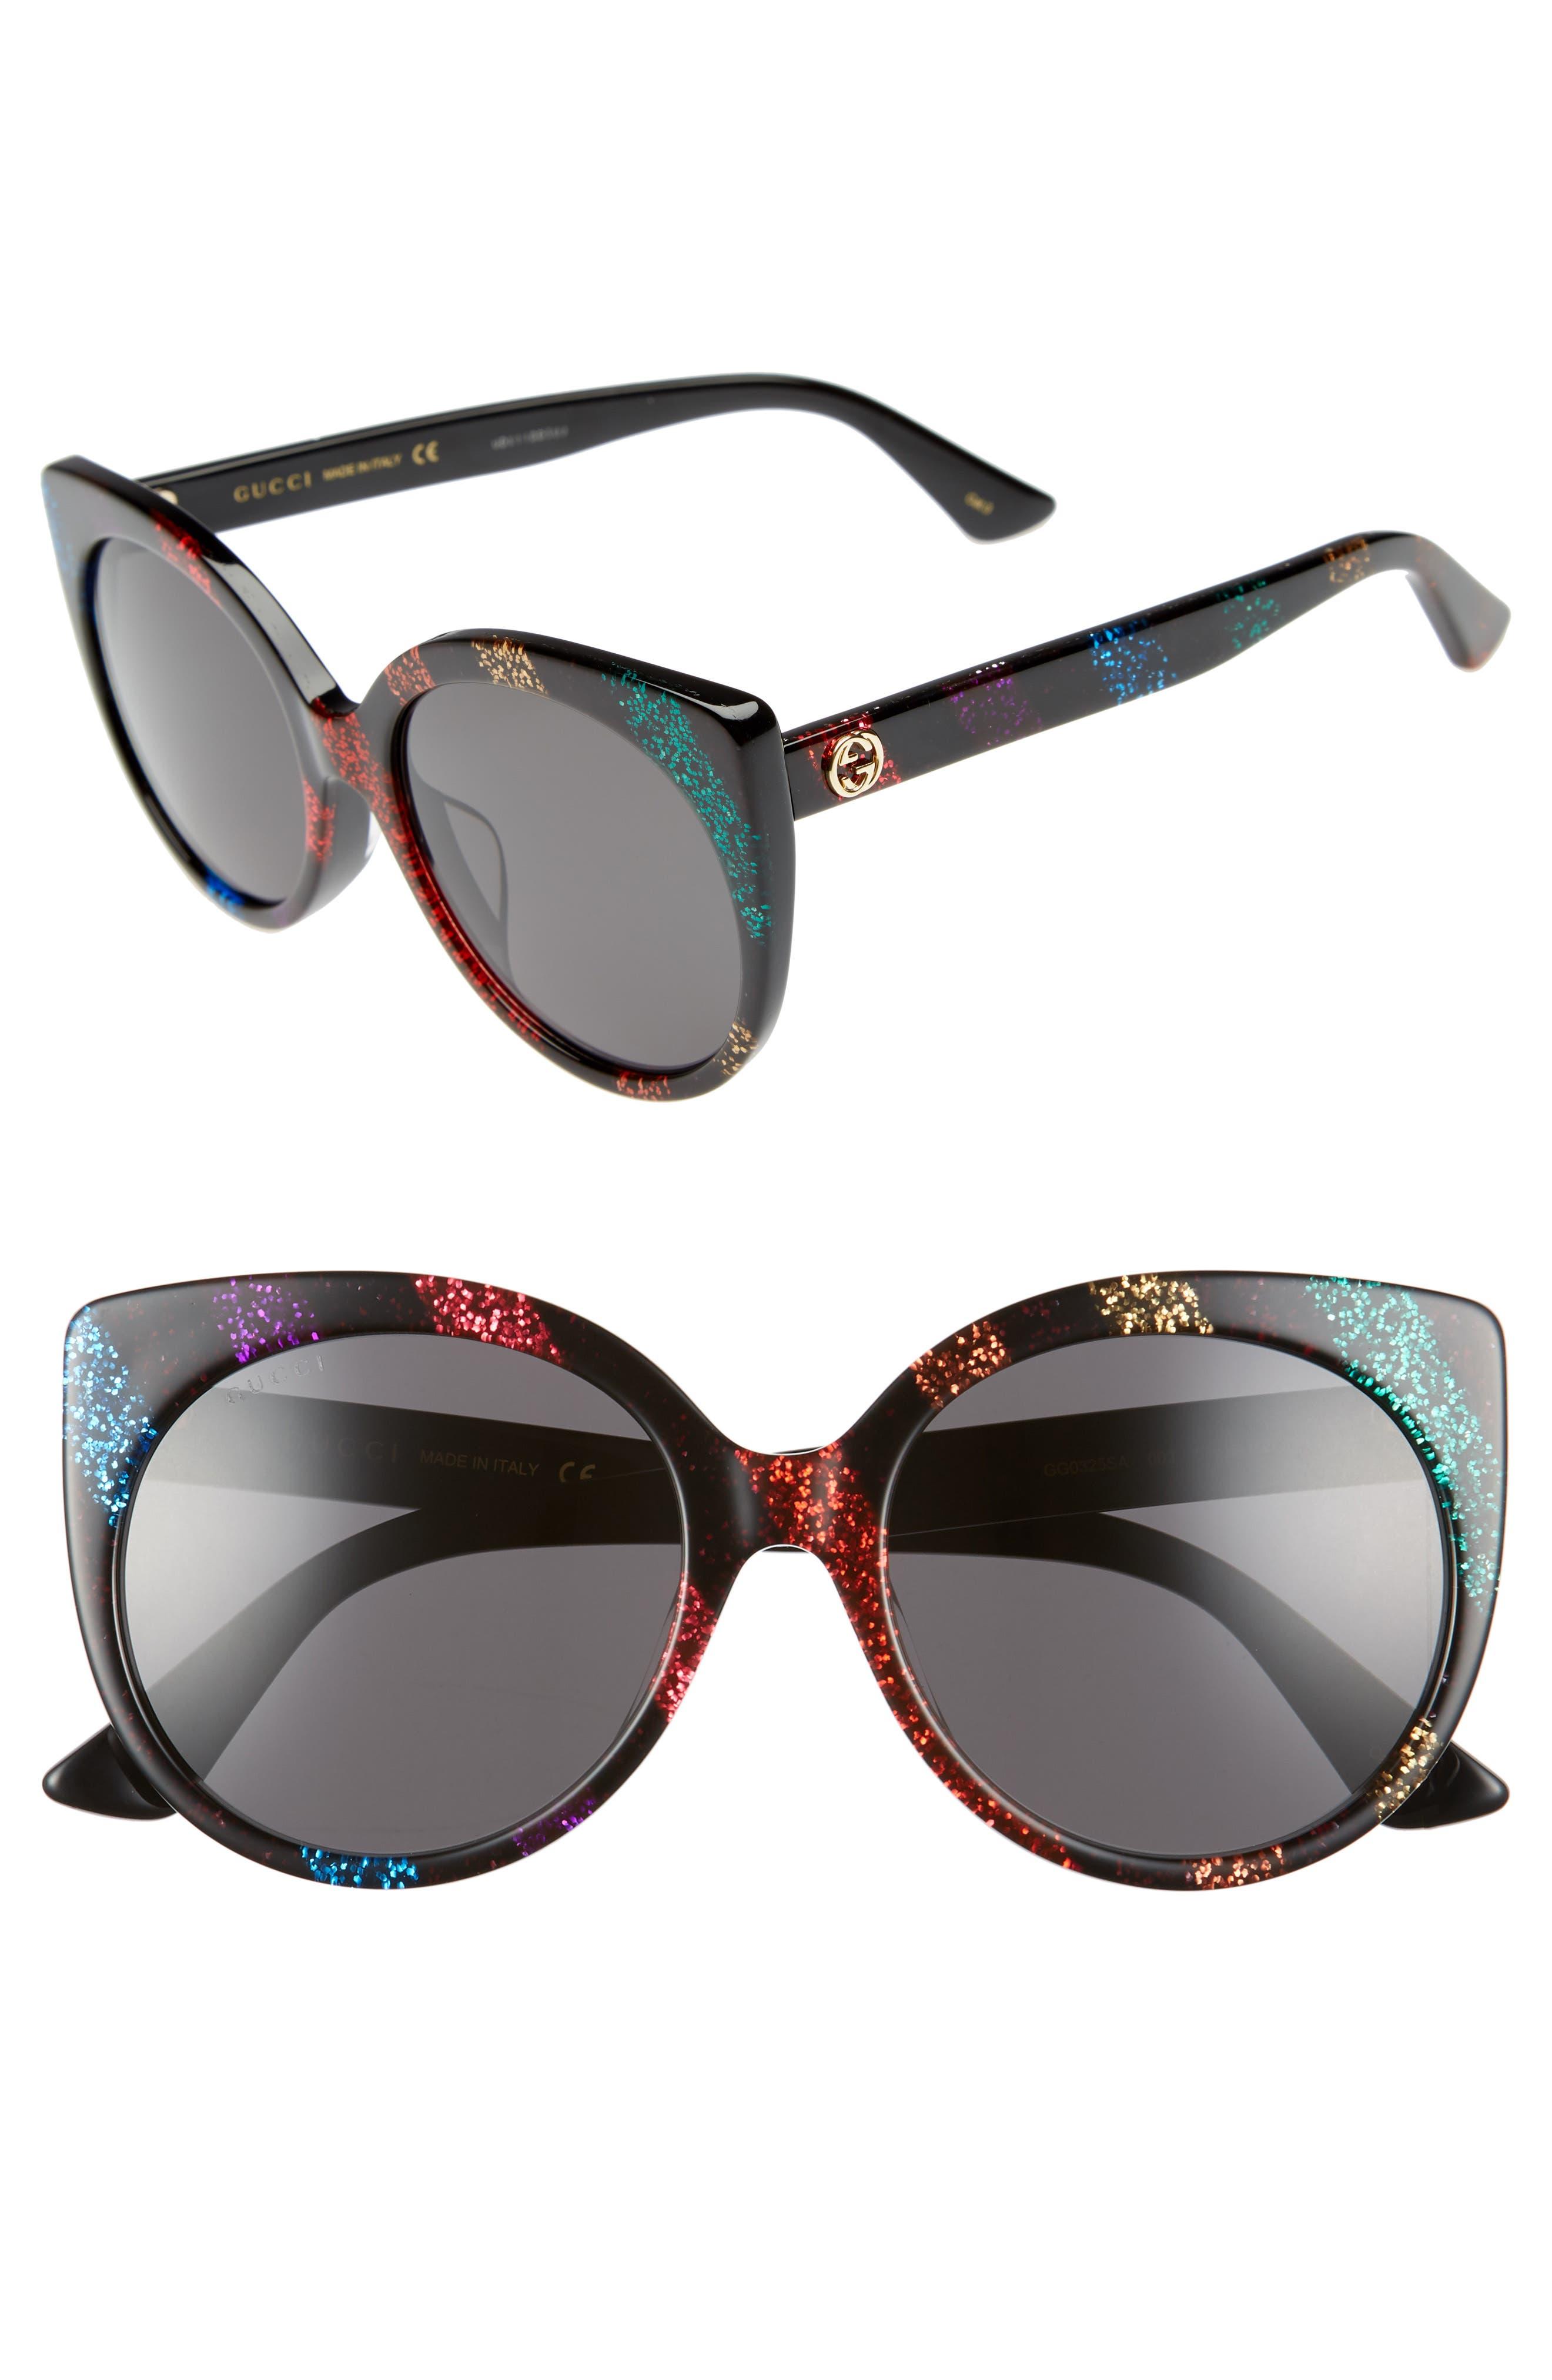 57mm Cat Eye Sunglasses,                             Main thumbnail 1, color,                             010